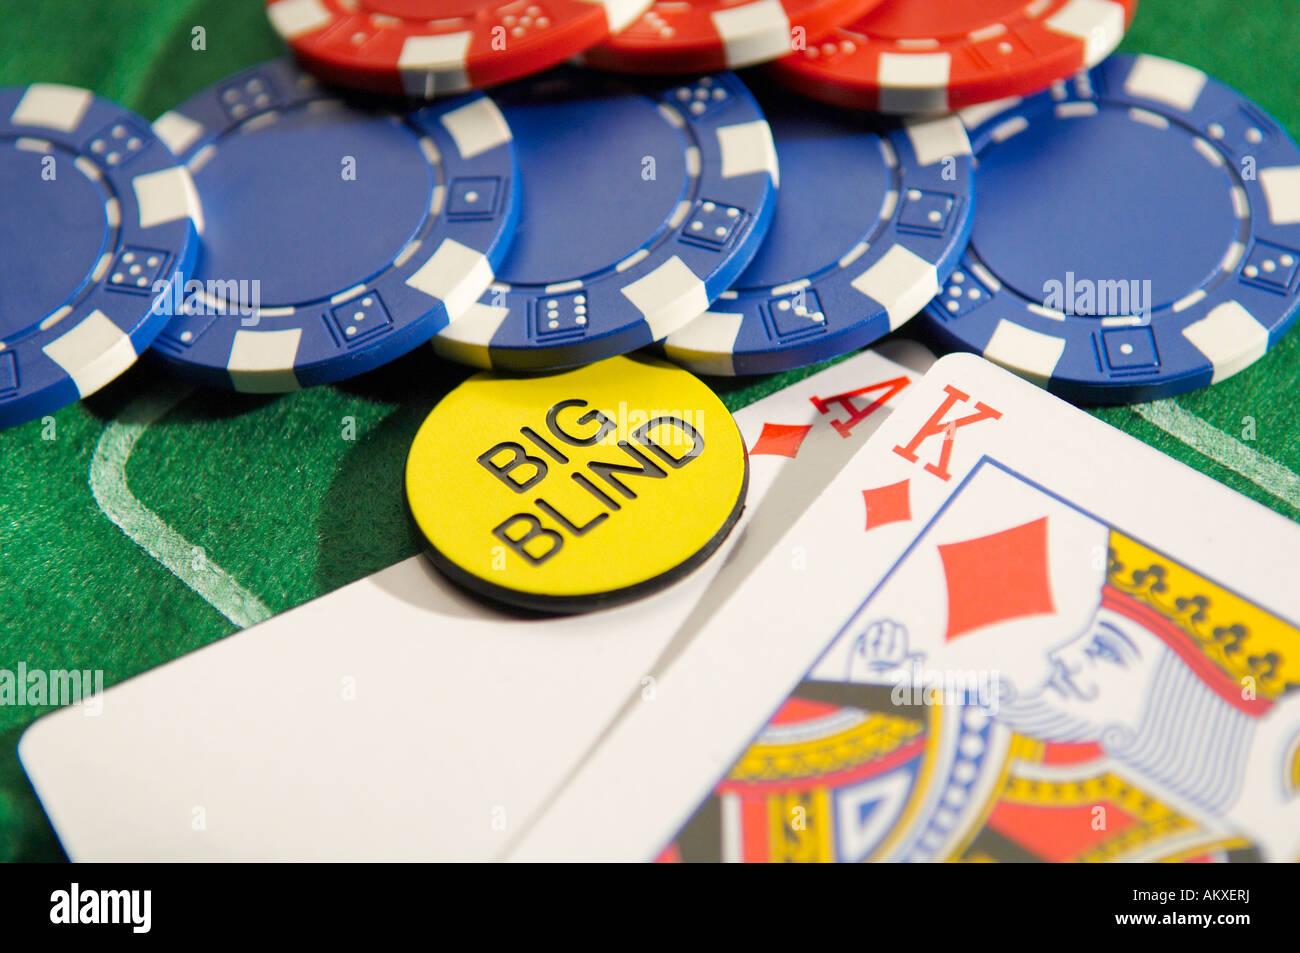 Texas Hold'em Poker Big Blind - Stock Image